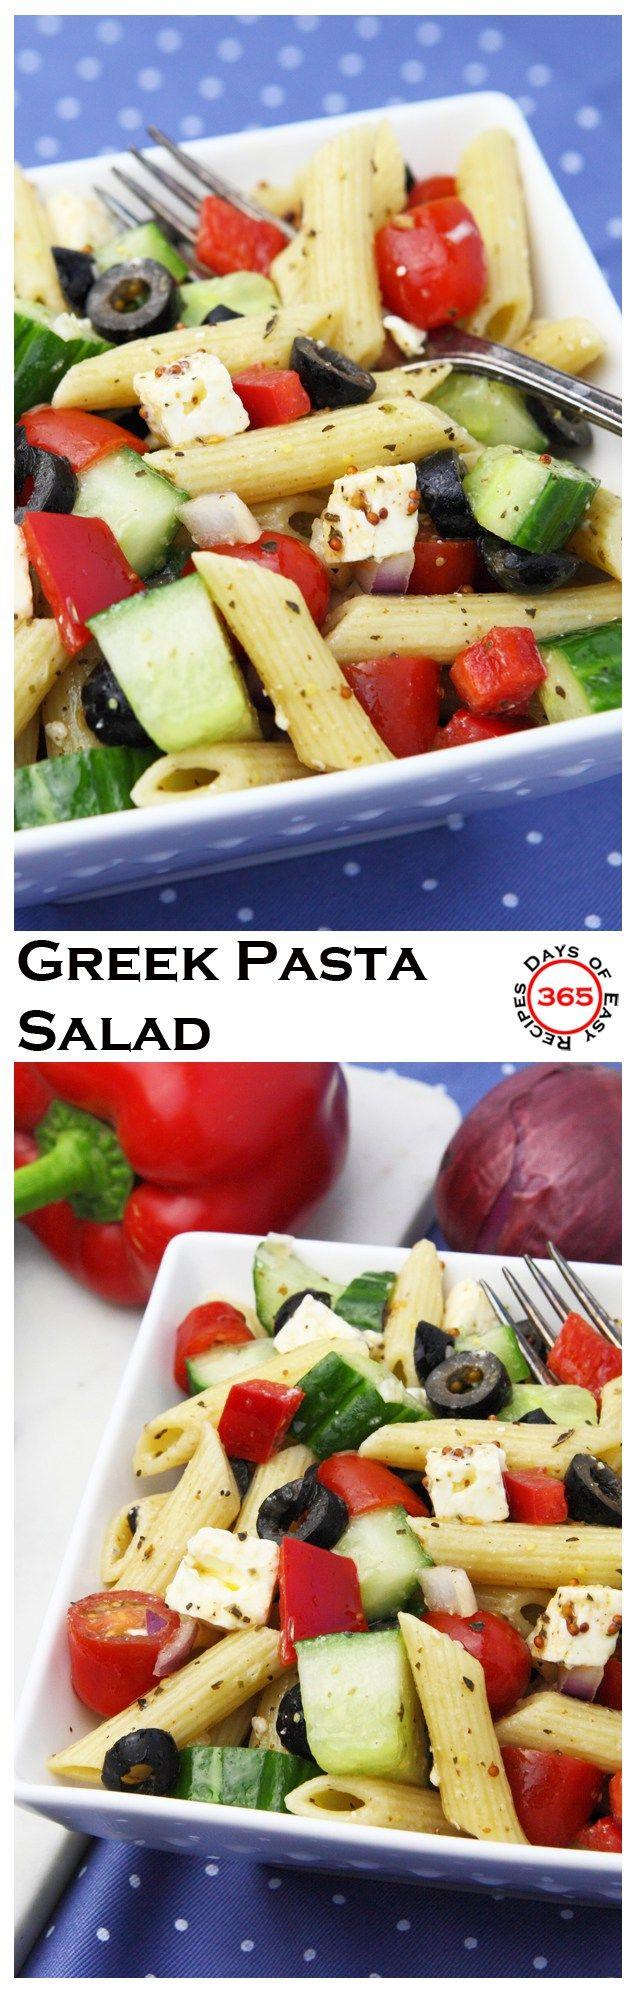 9594 Best Food Blogger Recipes Images On Pinterest